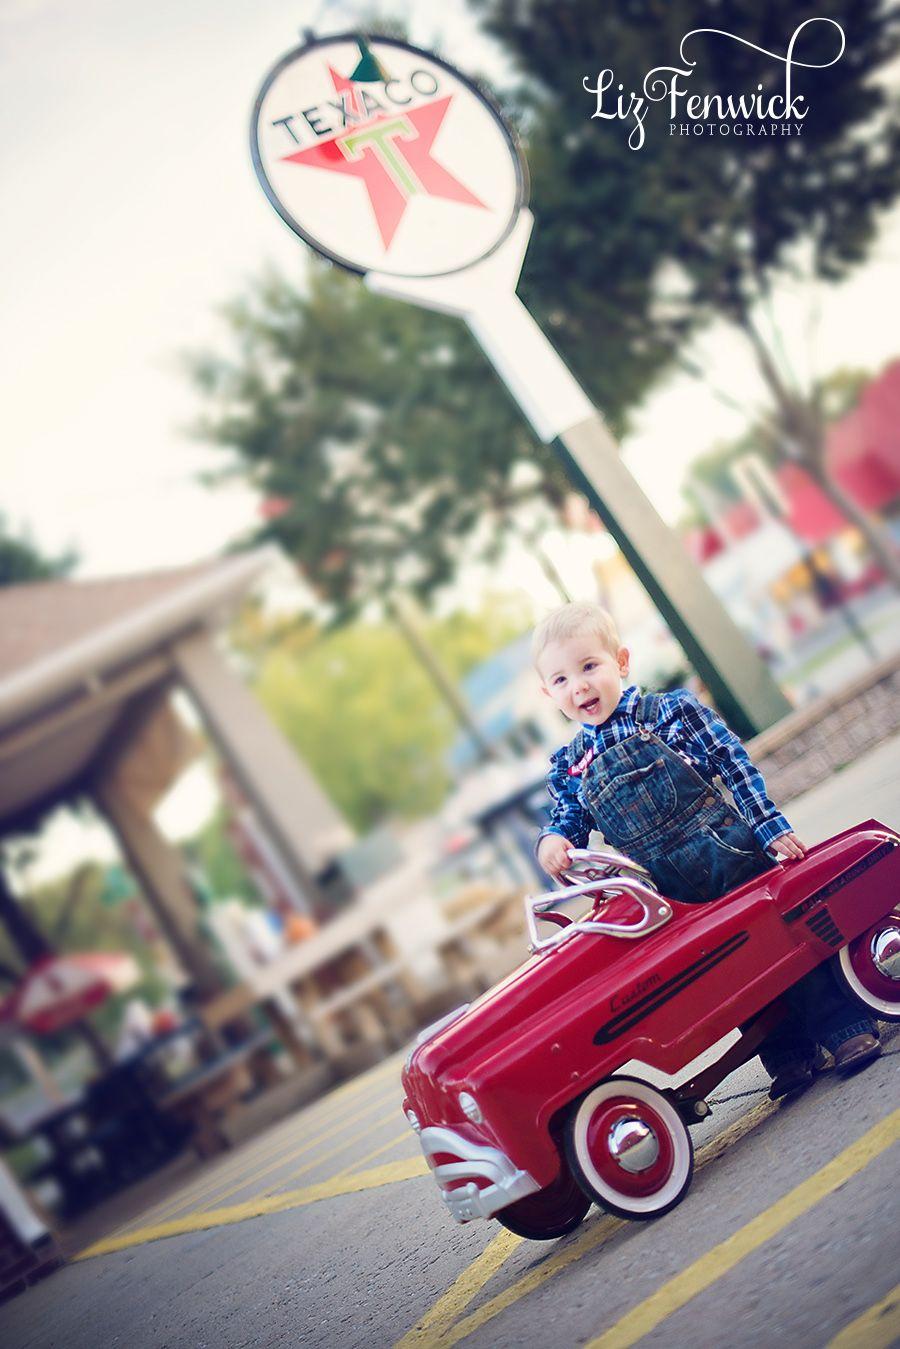 www.lizfenwickphotography.com car child gas pump photo